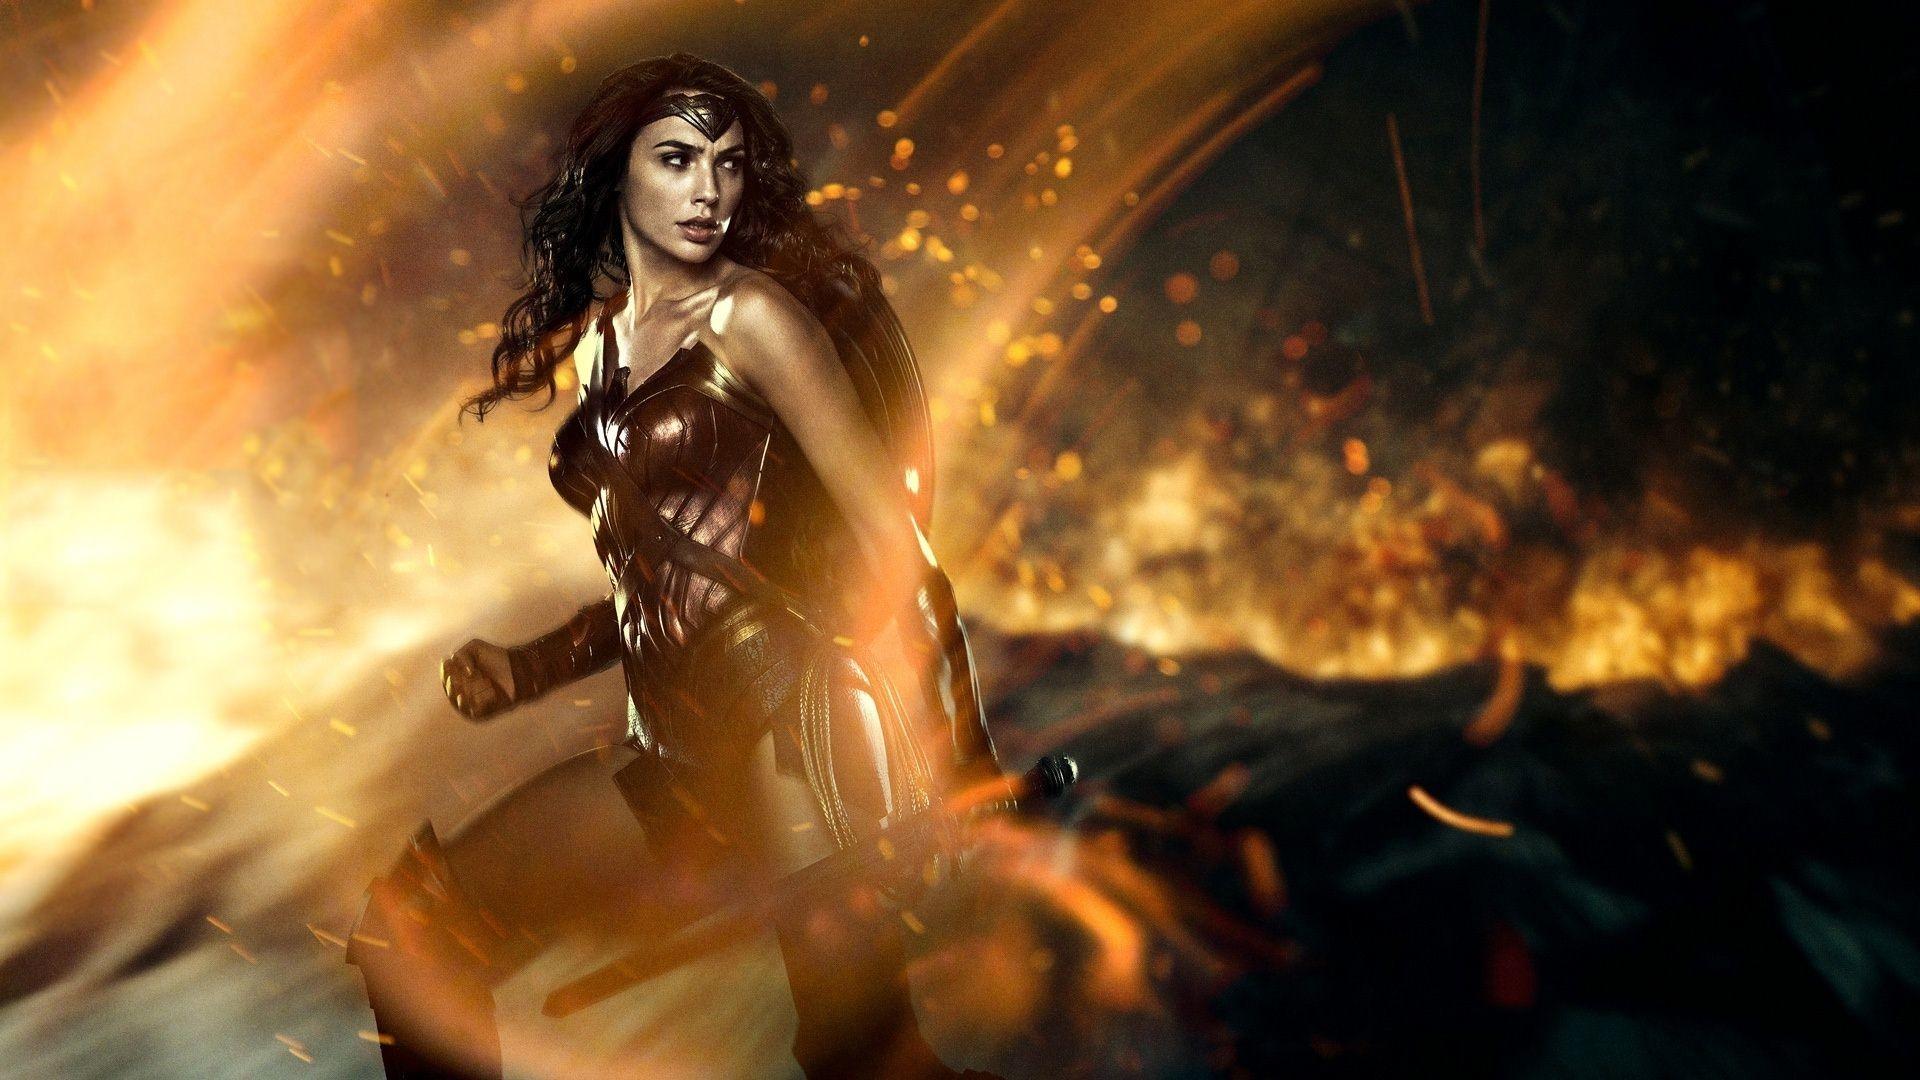 Wallpaper Gal Gadot Wonder Woman Hd Movies 7553: Wonder Woman Wallpaper (71+ Images